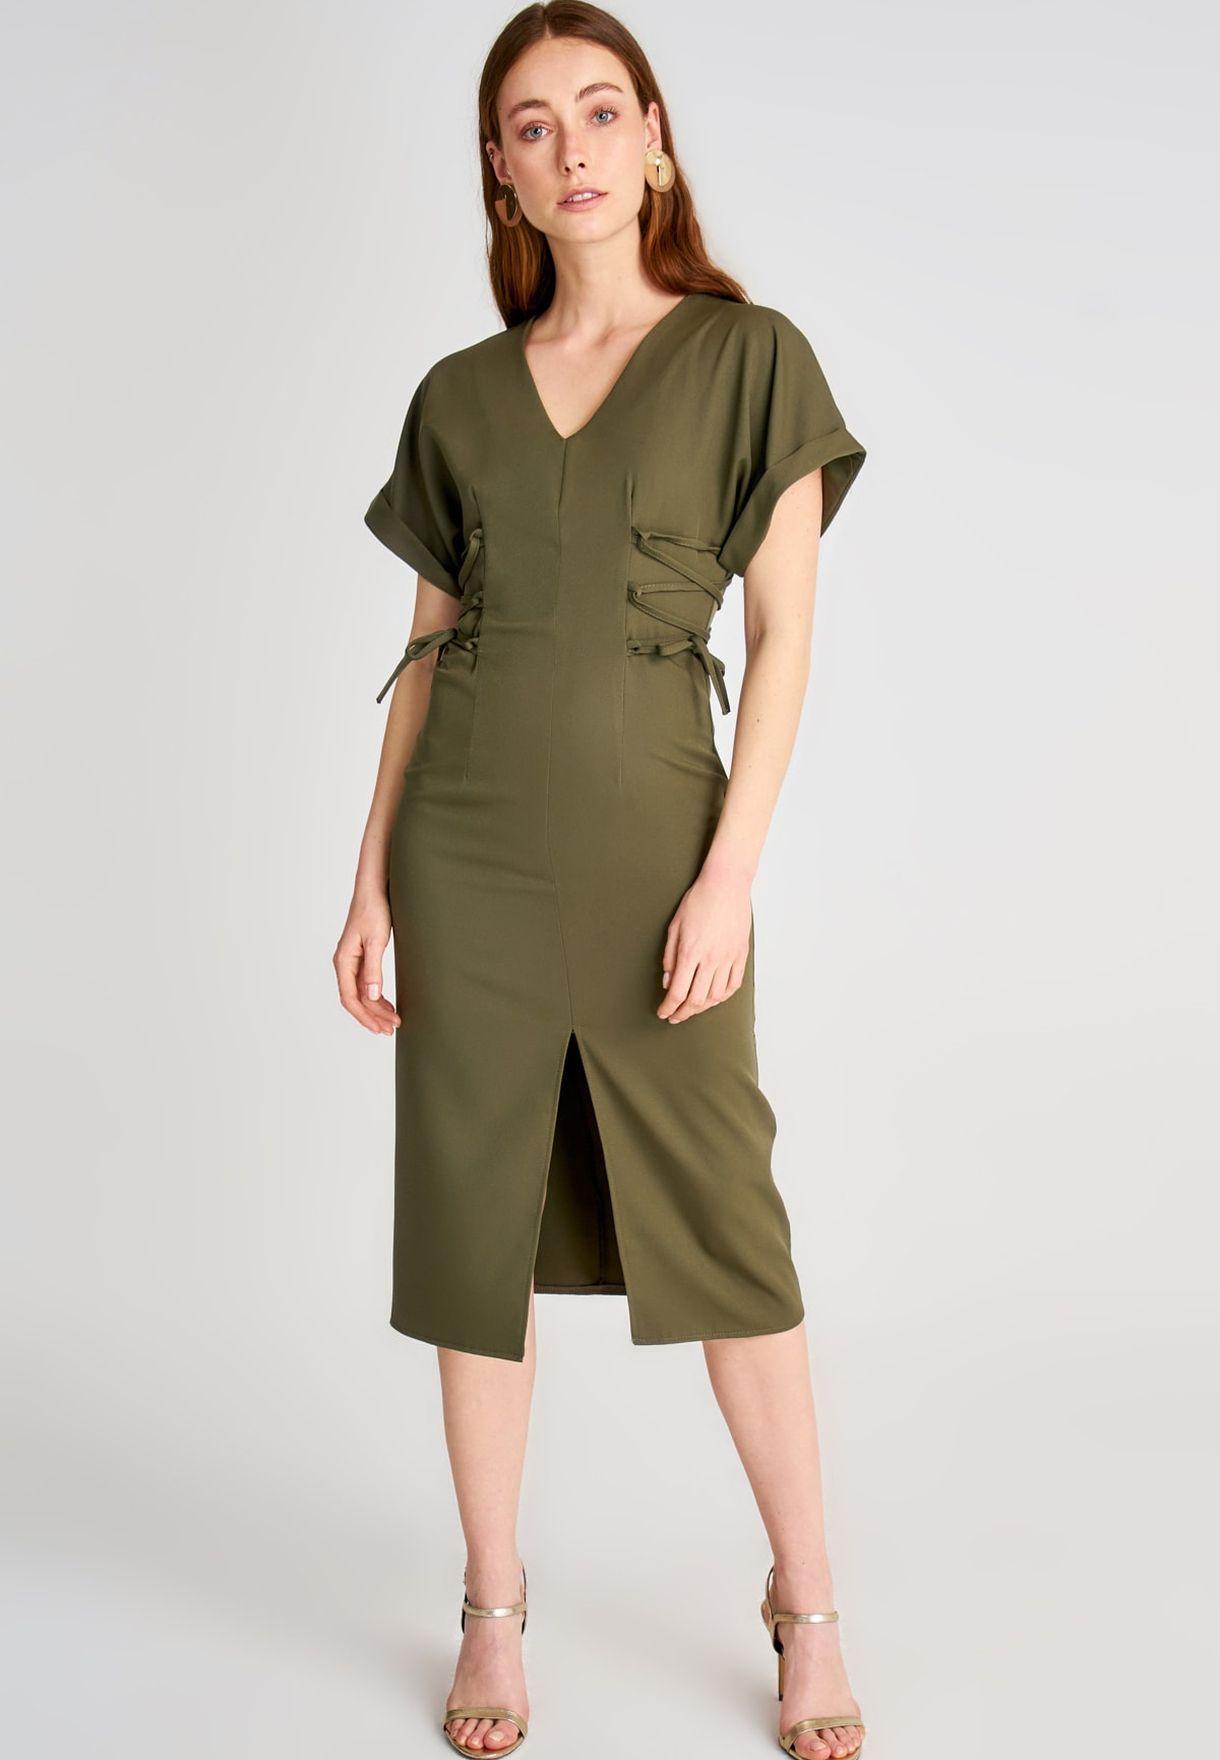 Trendyol Roll Sleeve Front Slit Dress - Women Clothing P4nP1